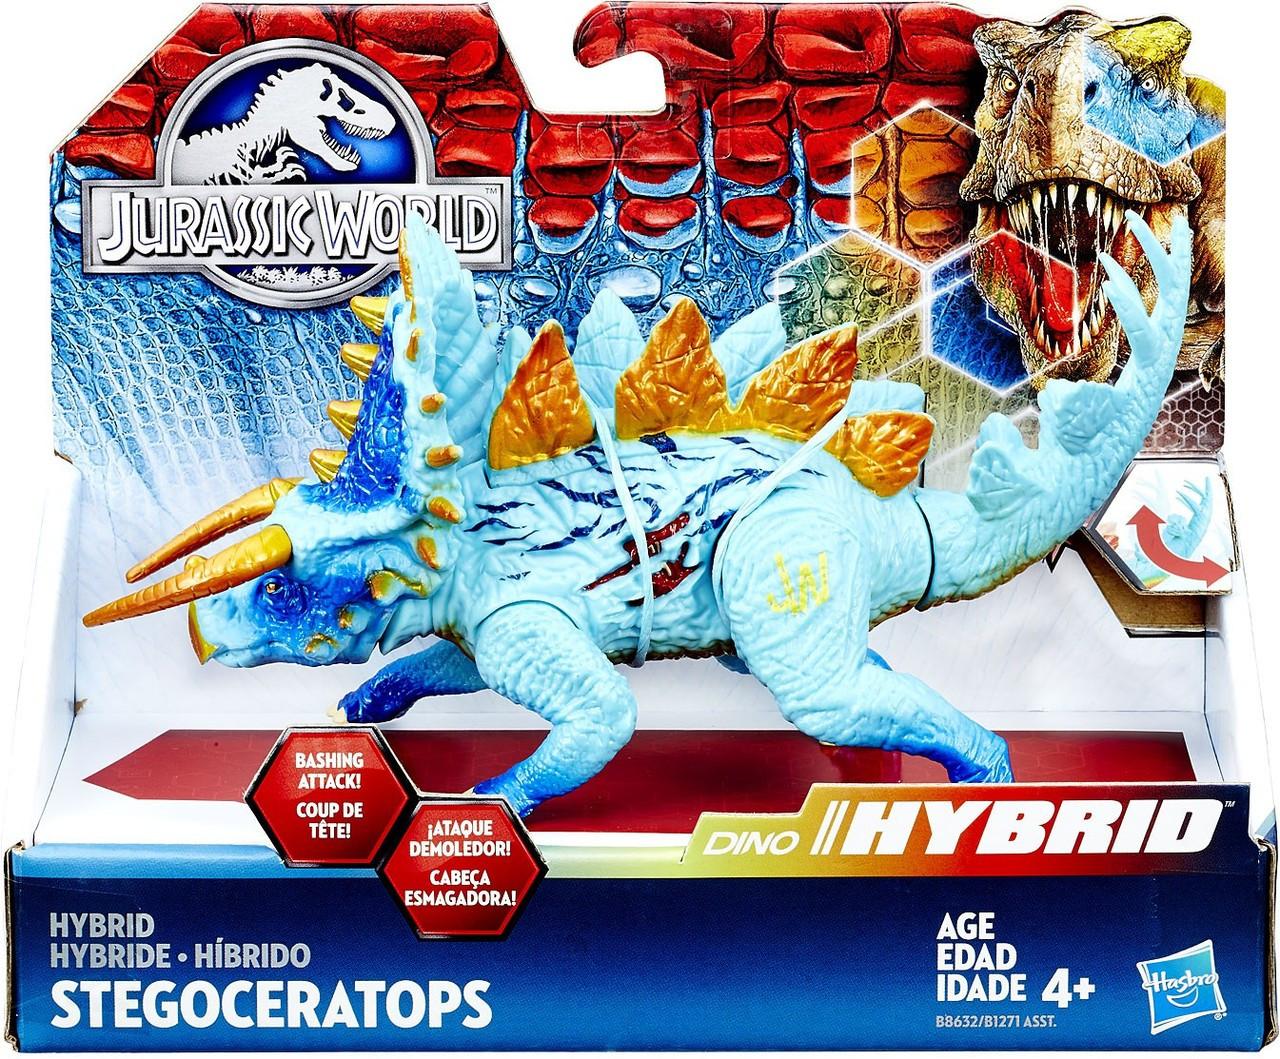 Jurassic World Bashers & Biters Hybrid Stegoceratops Action Figure